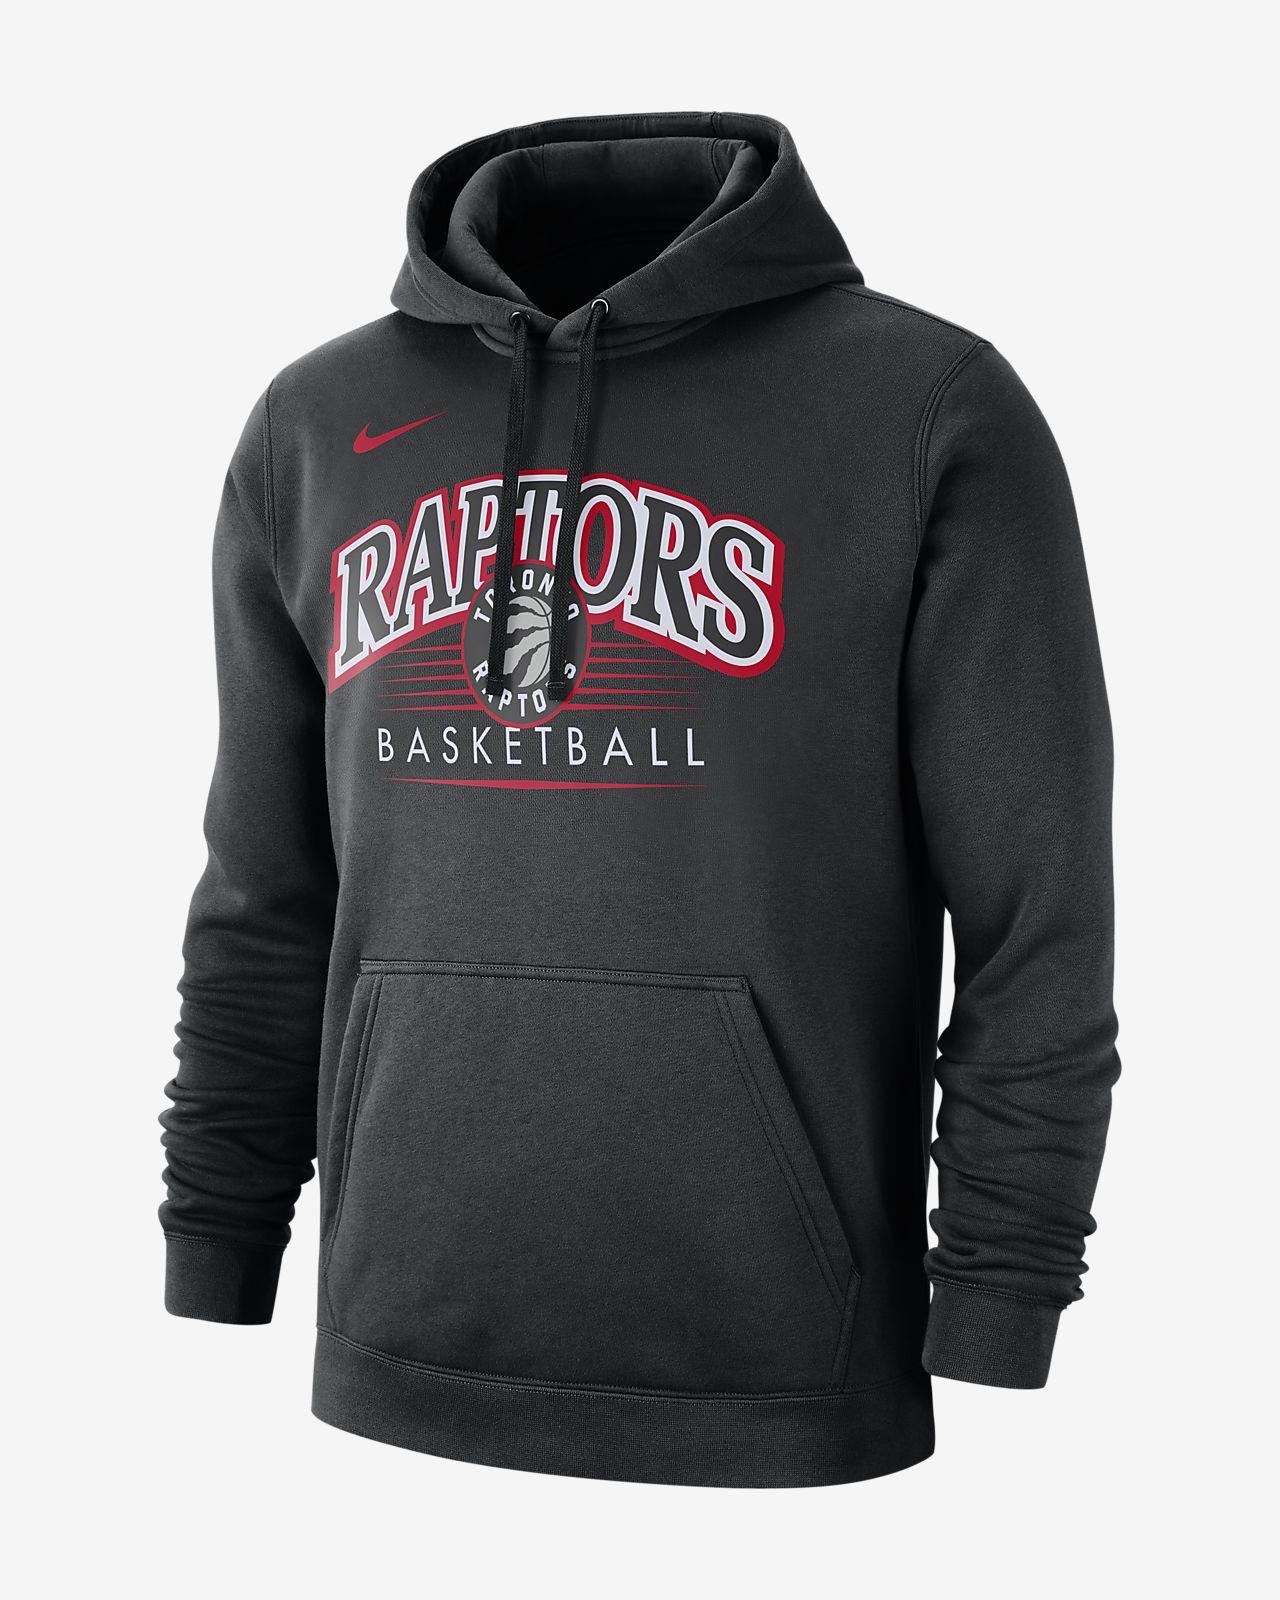 be31d9d213a4 Toronto Raptors Nike Men s NBA Hoodie. Nike.com SA